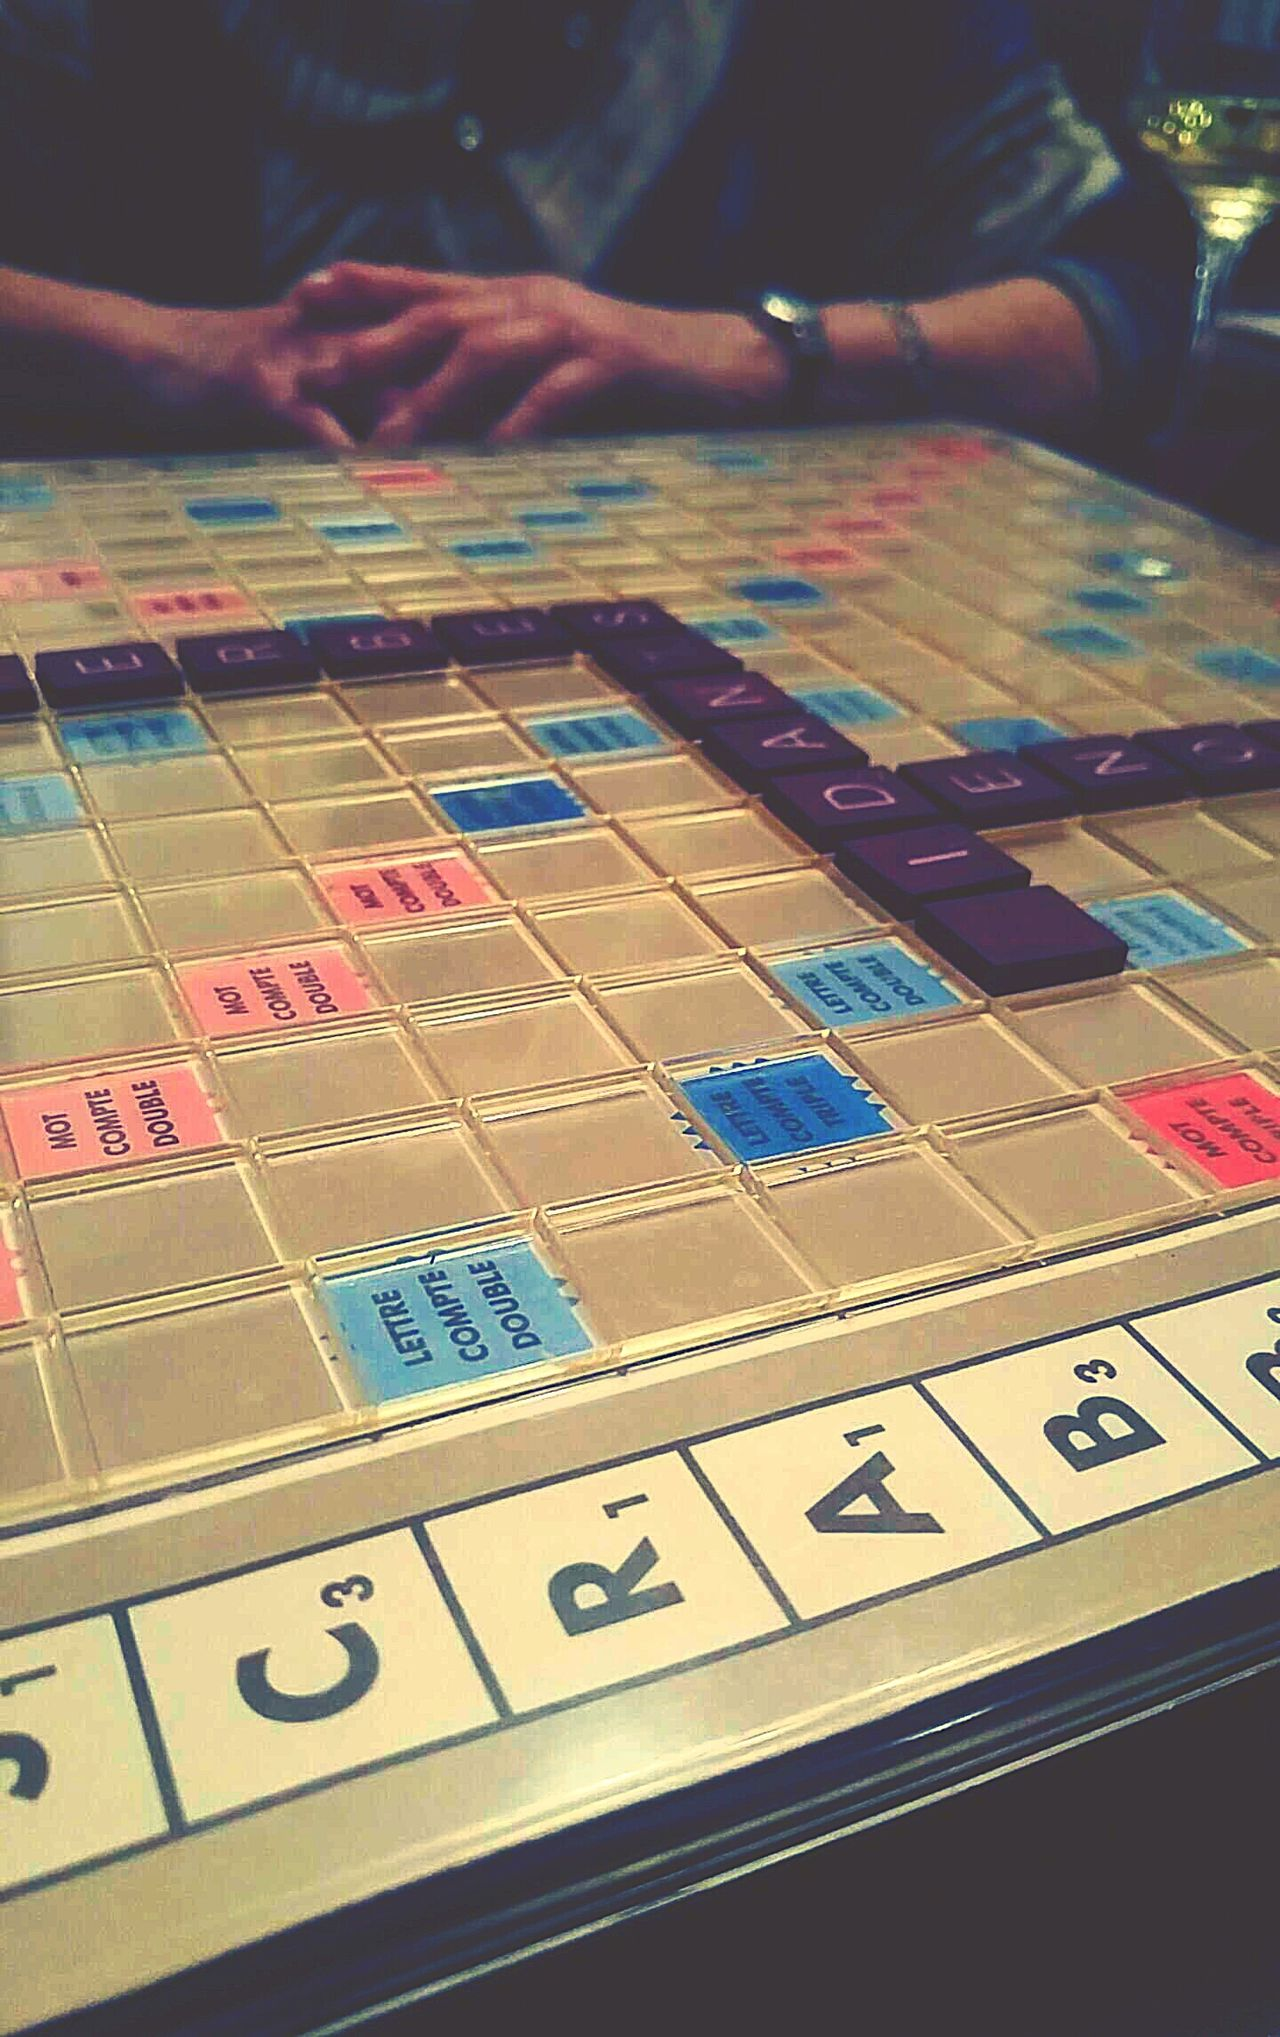 Scrabble Scrabble Art Scrabble Tiles